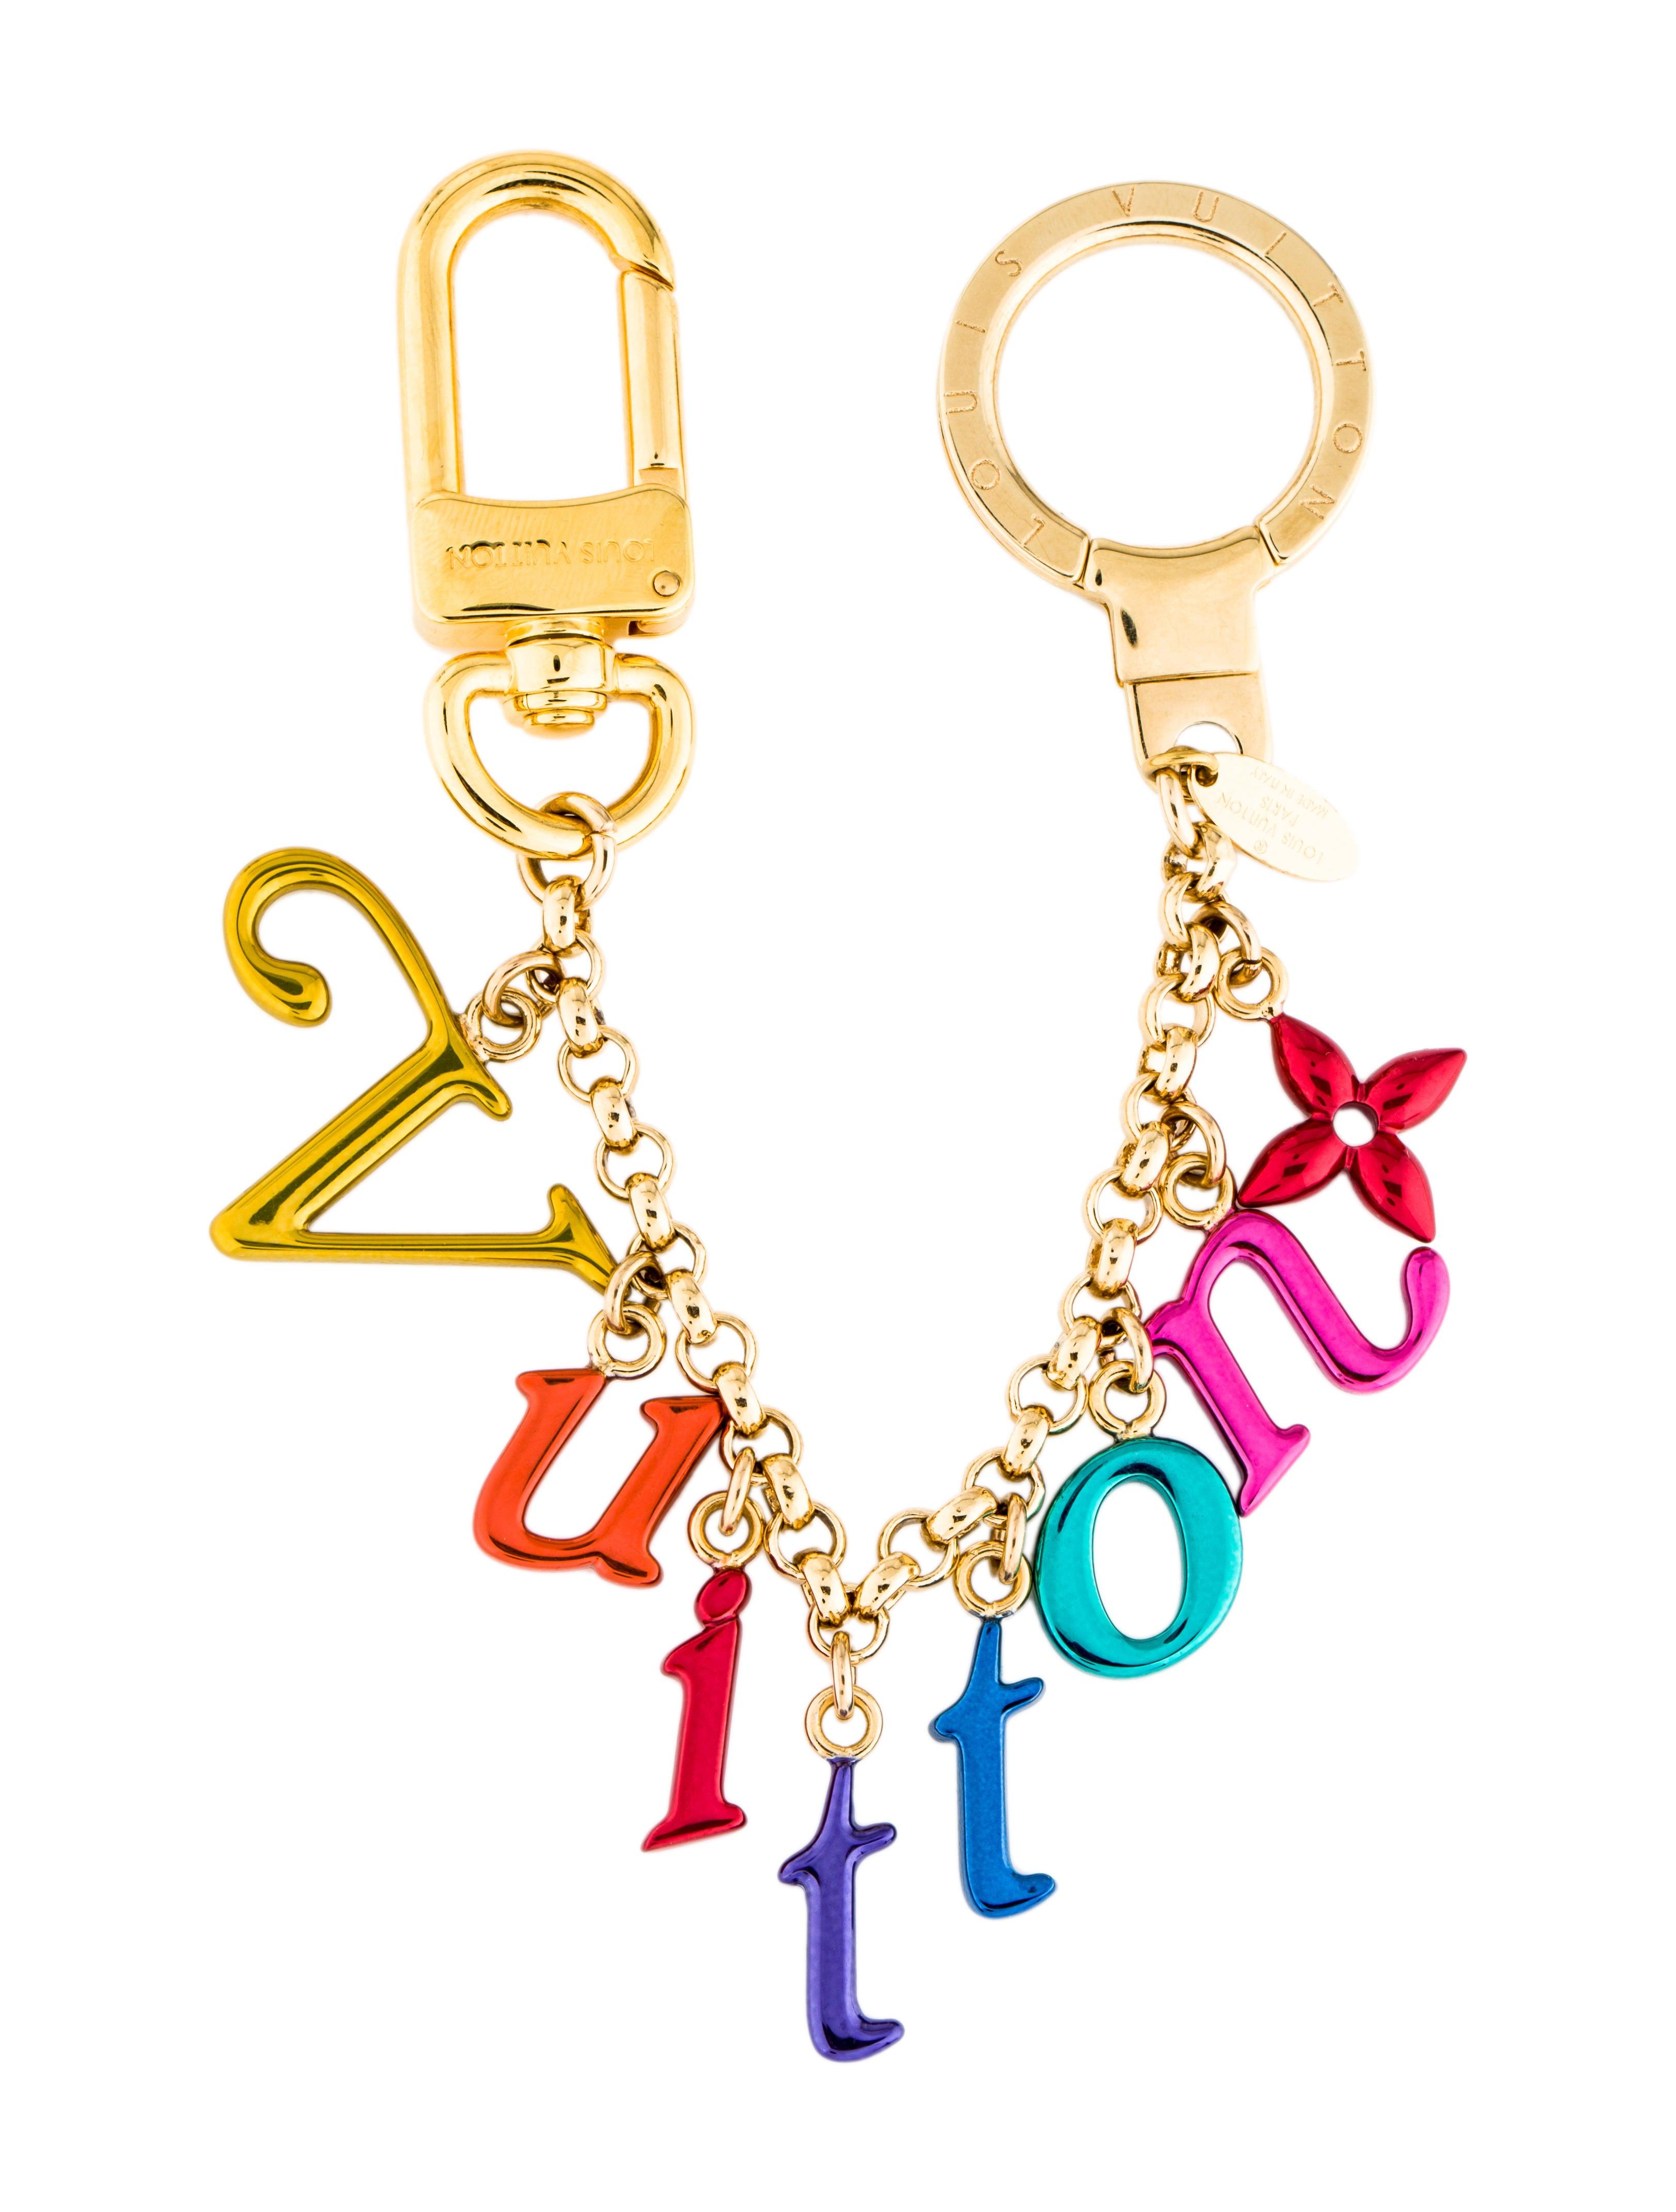 97b14d766 Louis Vuitton New Wave Chain Bag Charm - Accessories - LOU195924 ...